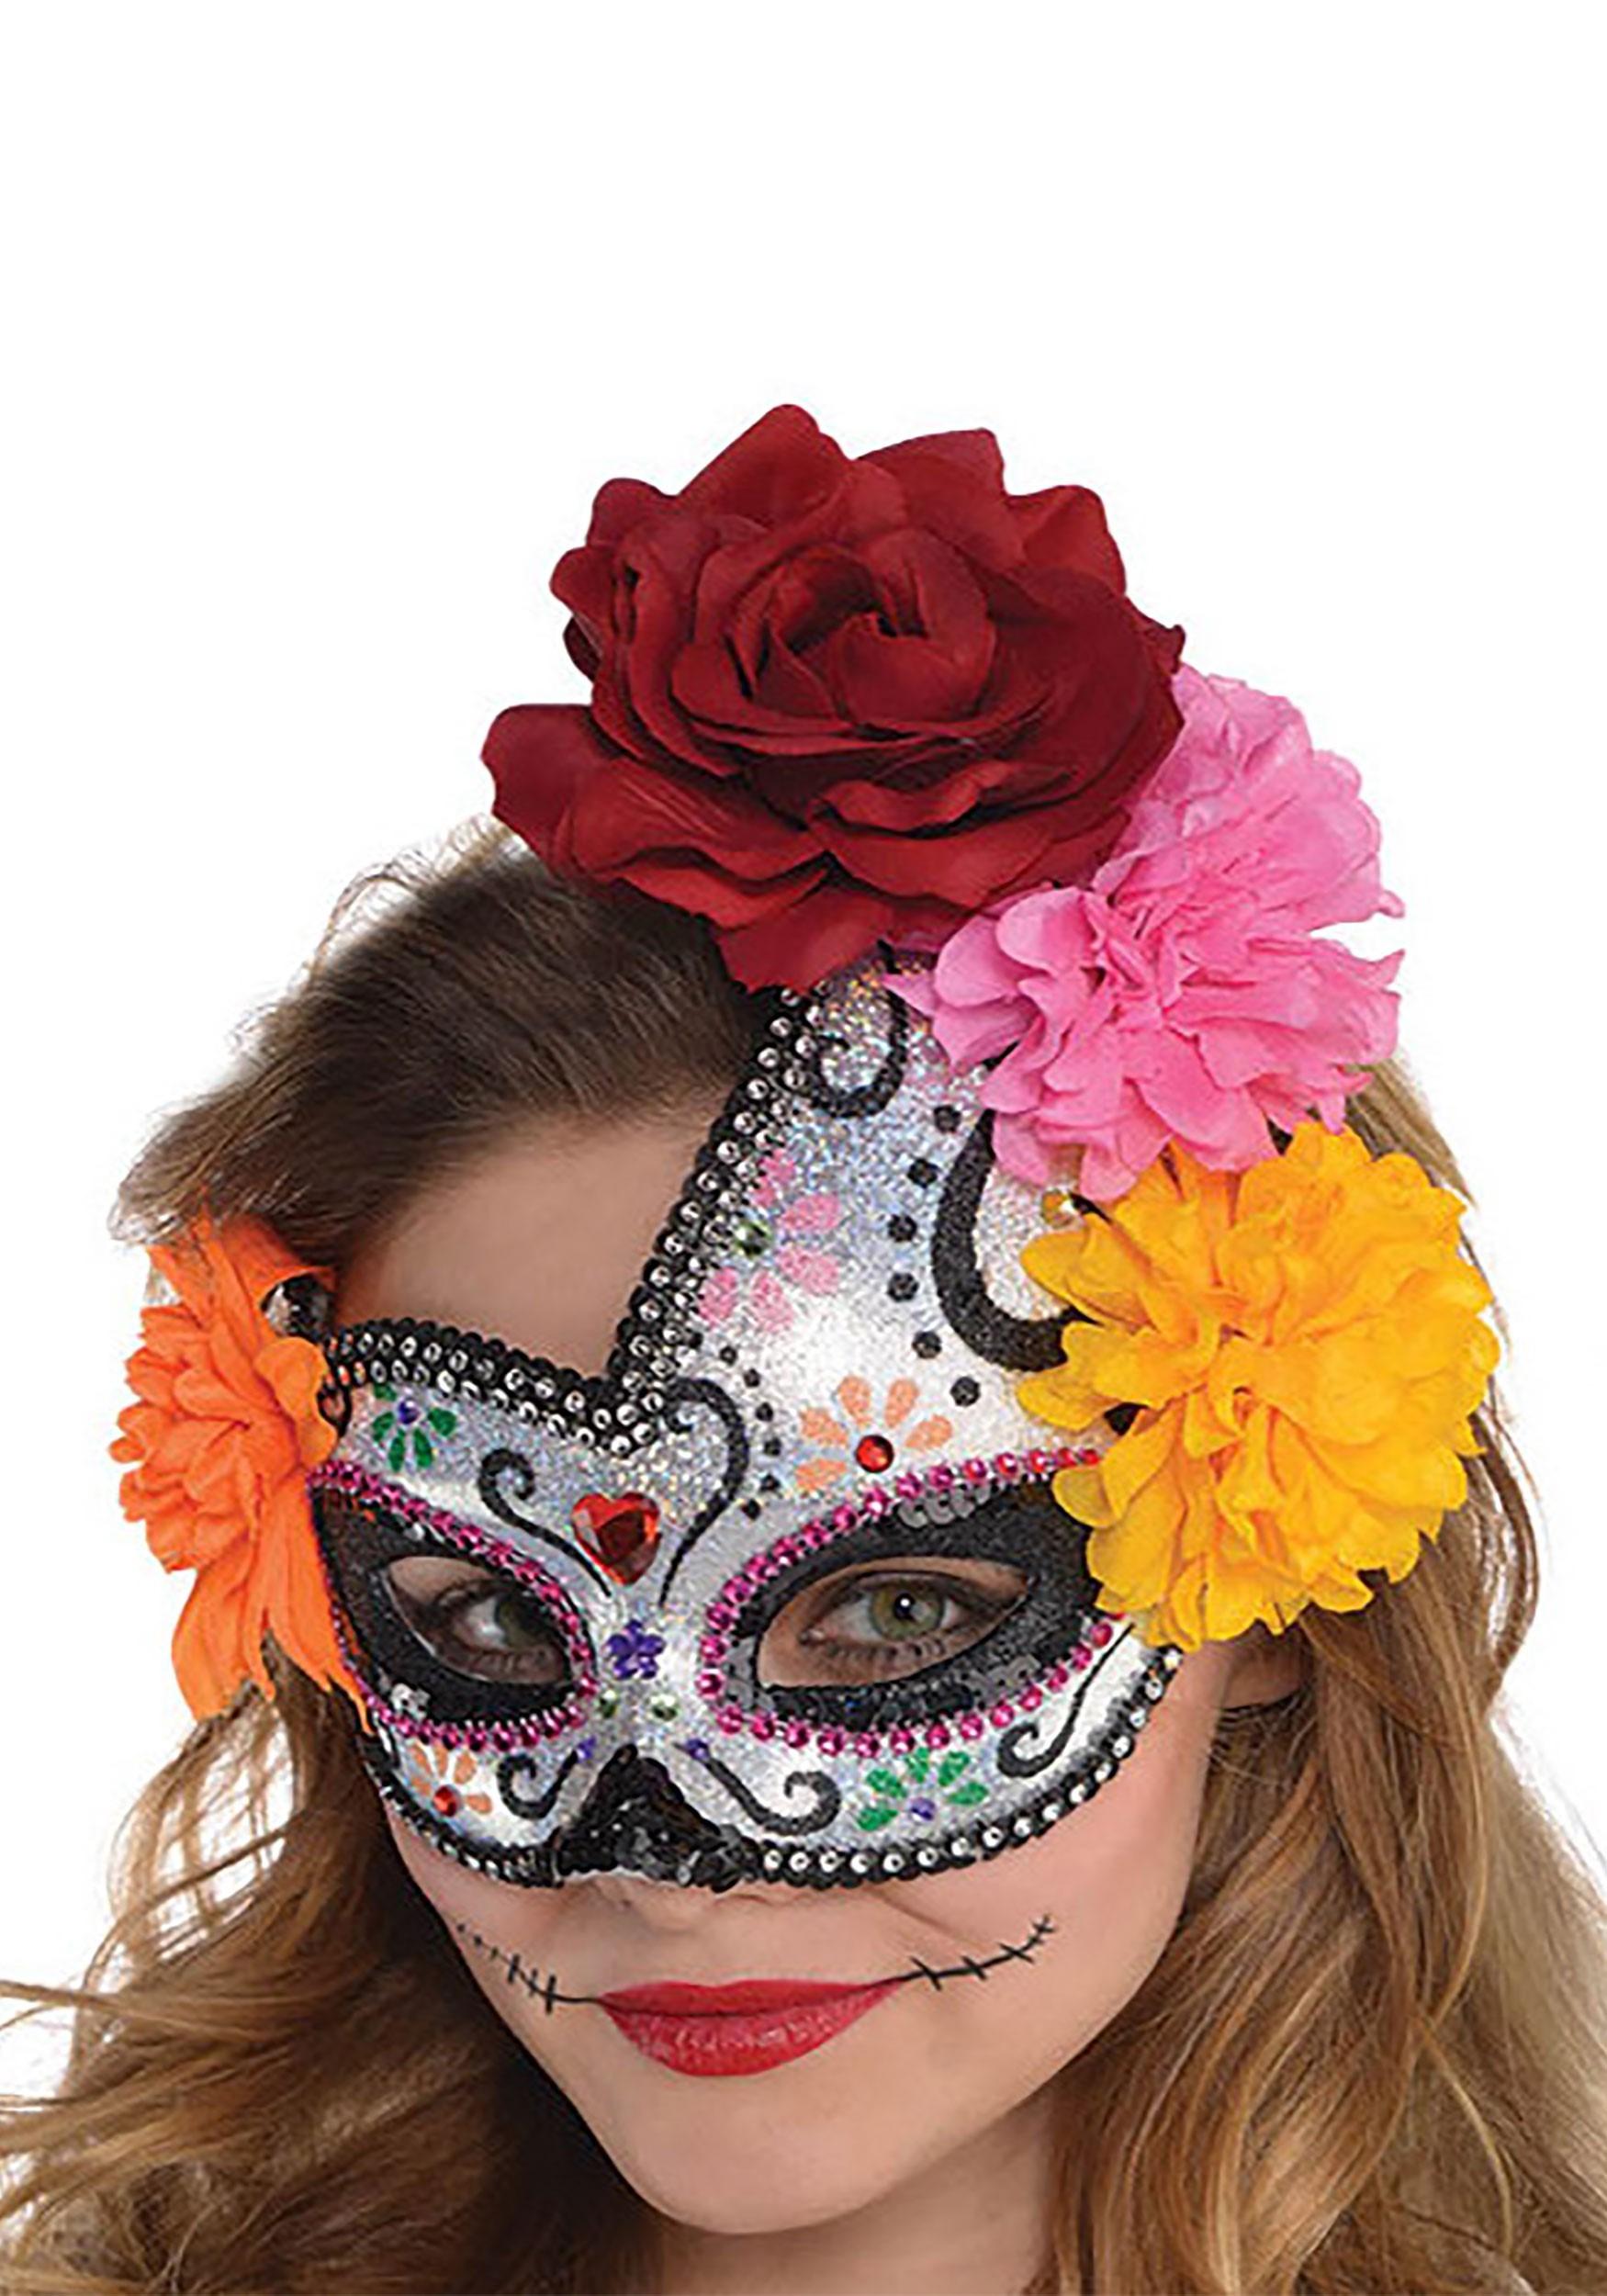 Sugar_Skull_Women's_Mask